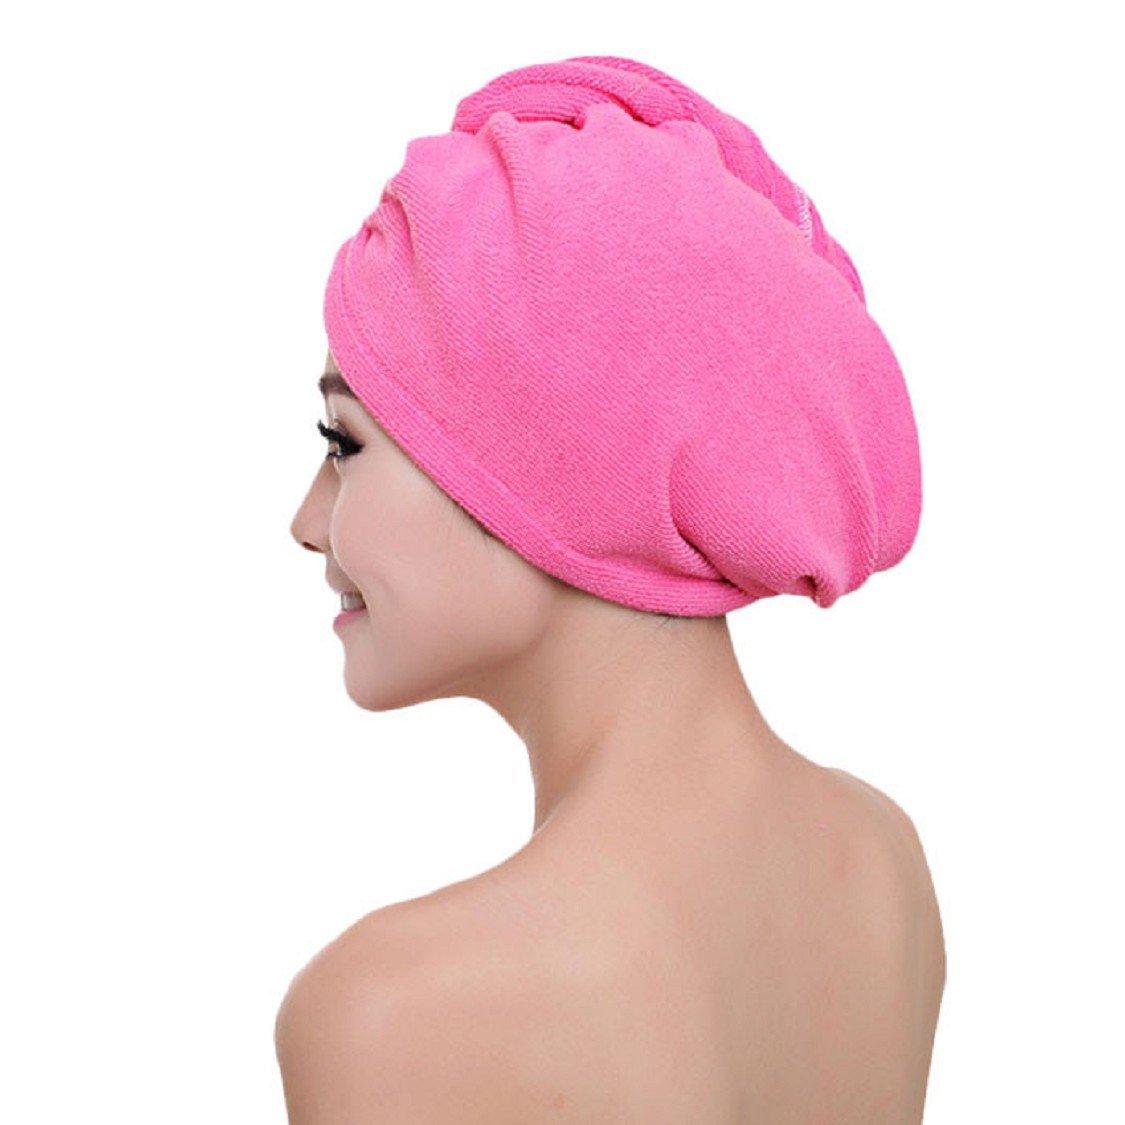 Ikevan Fashion Women Absorbent Microfiber Towel Turban Hair-Drying Cap Bathrobe Hat (04)